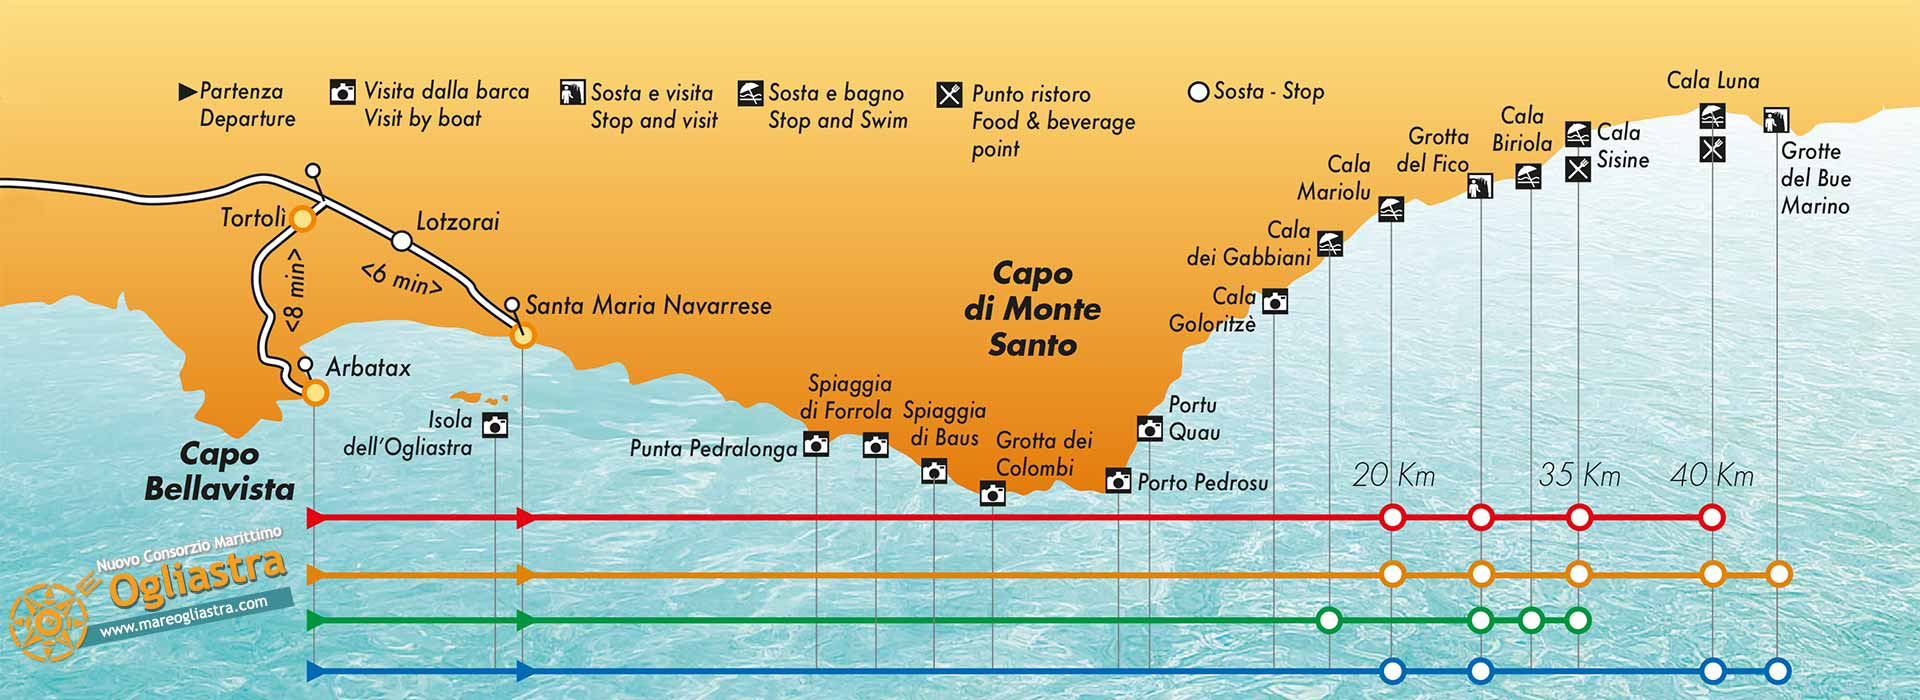 Motor ship Tour Excursions Sardinia